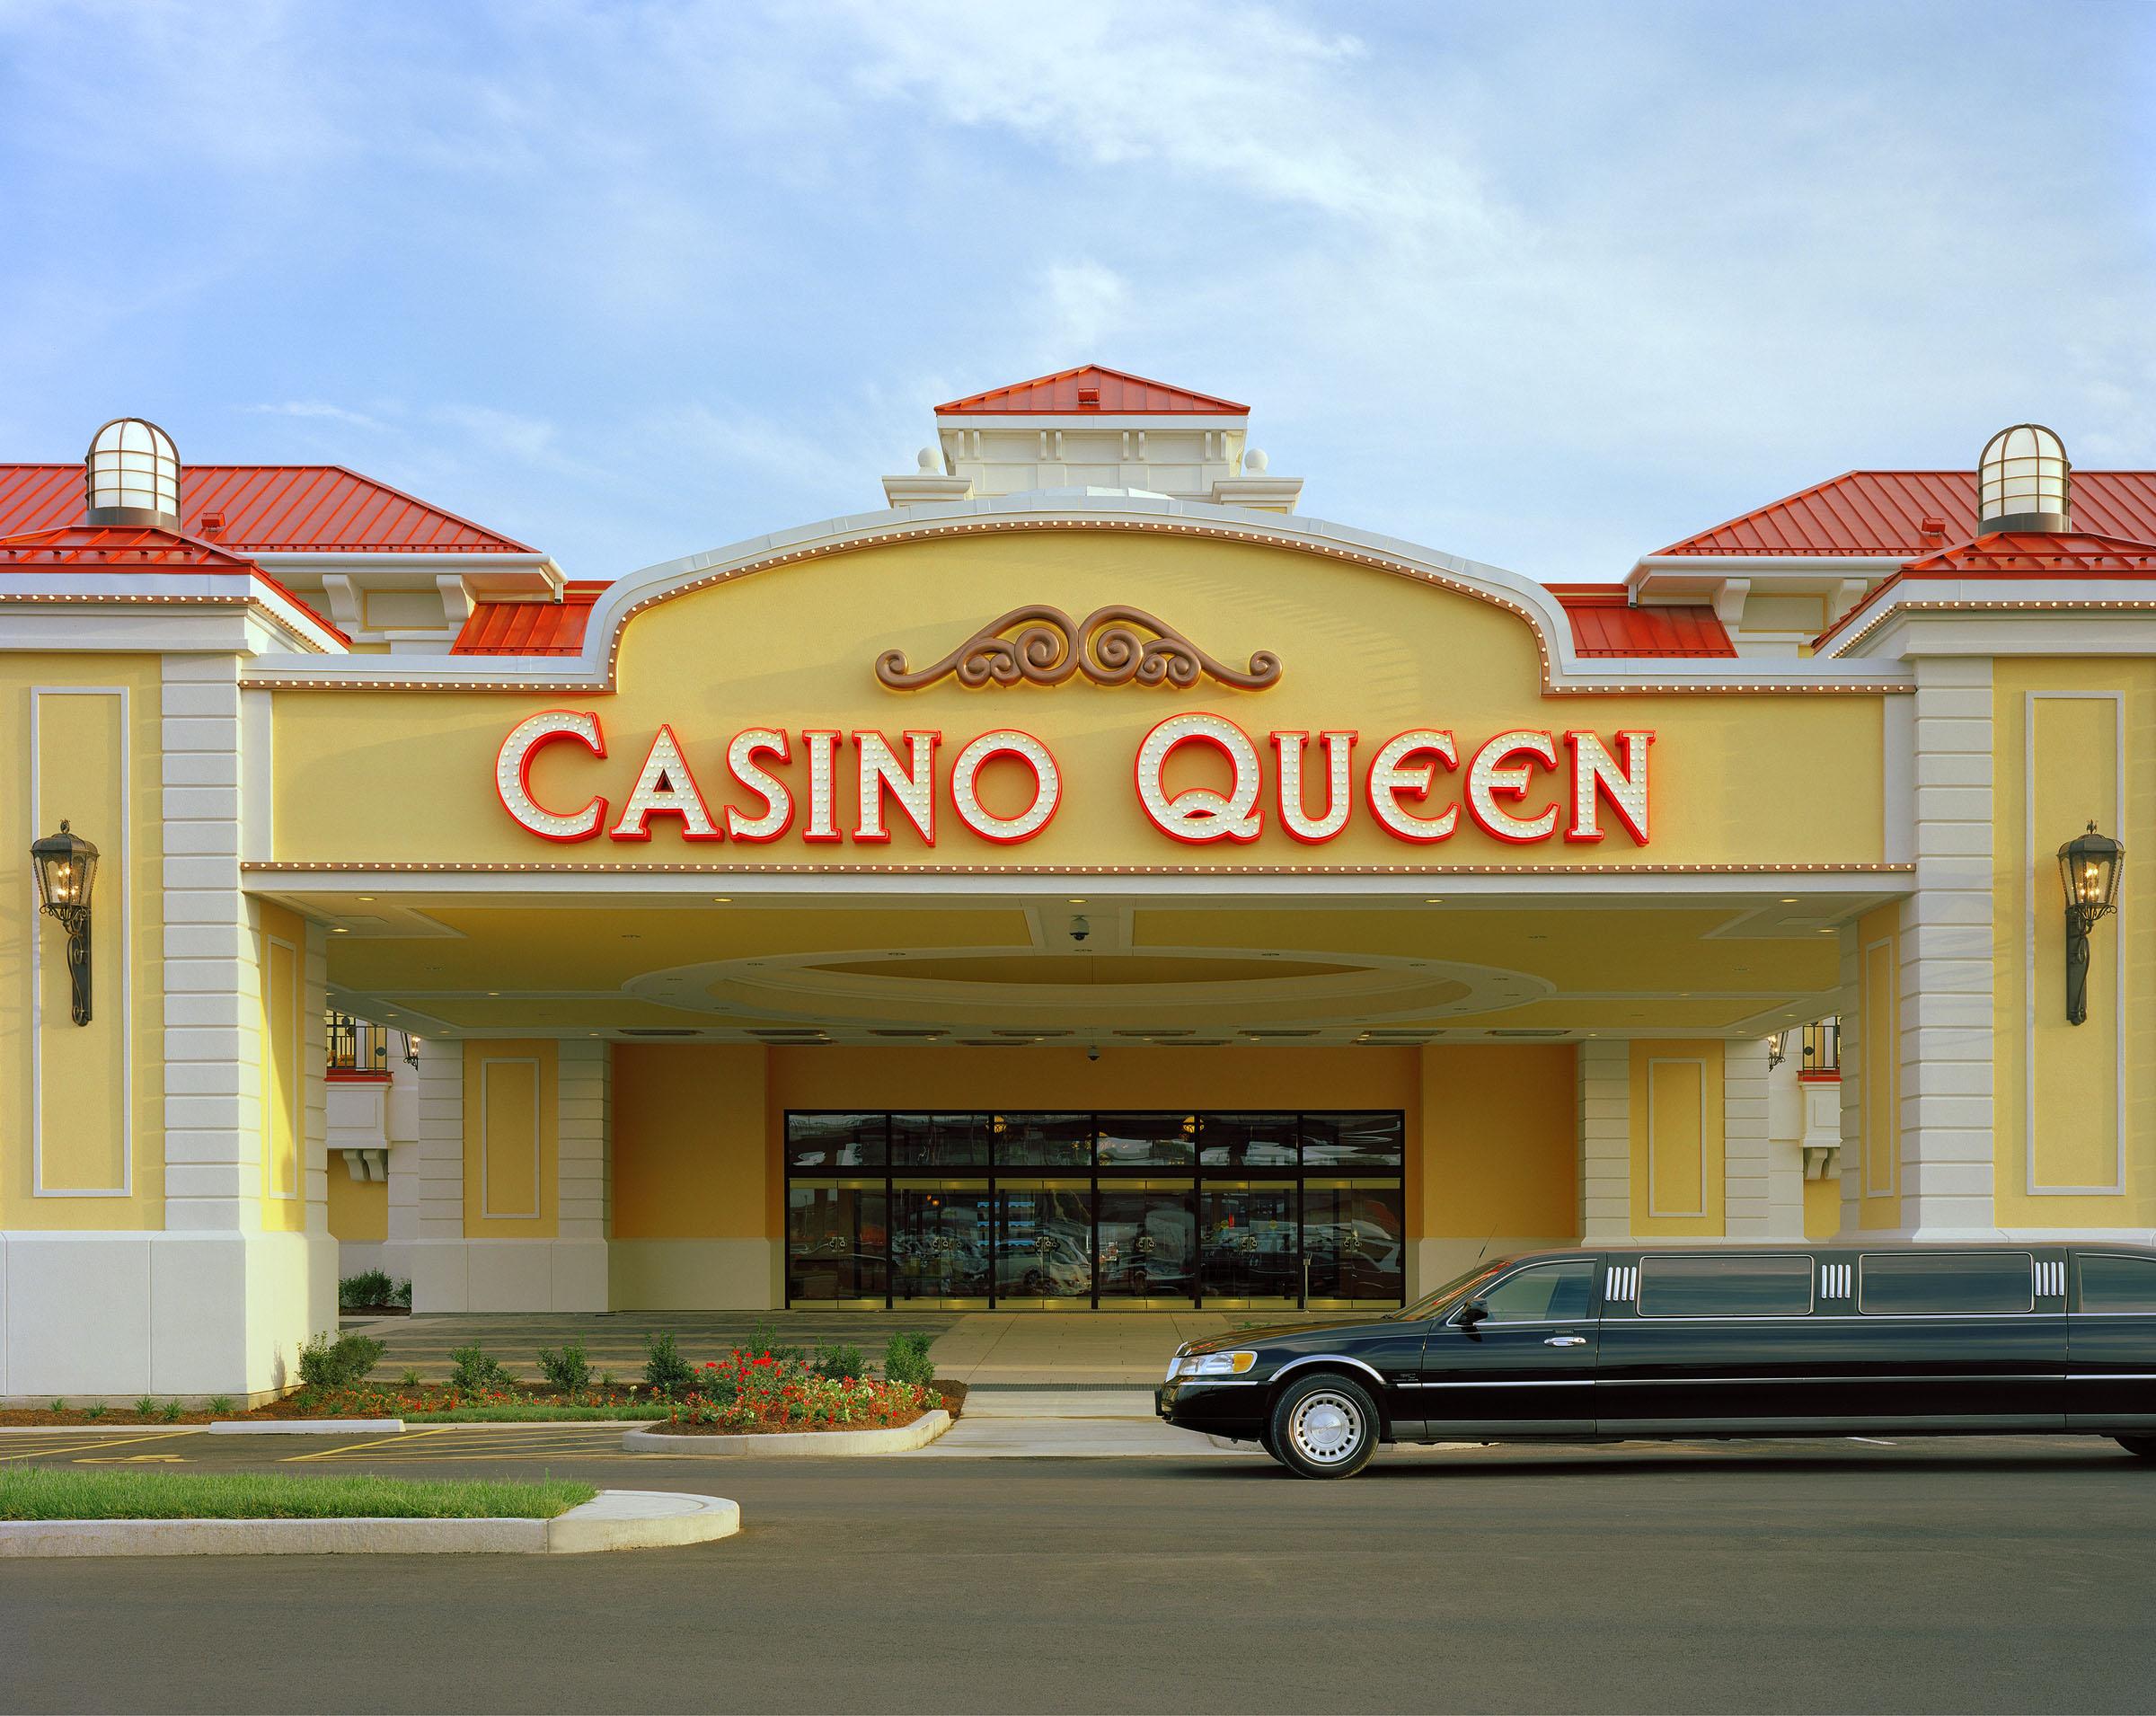 Casino Queen Hotel and RV Park